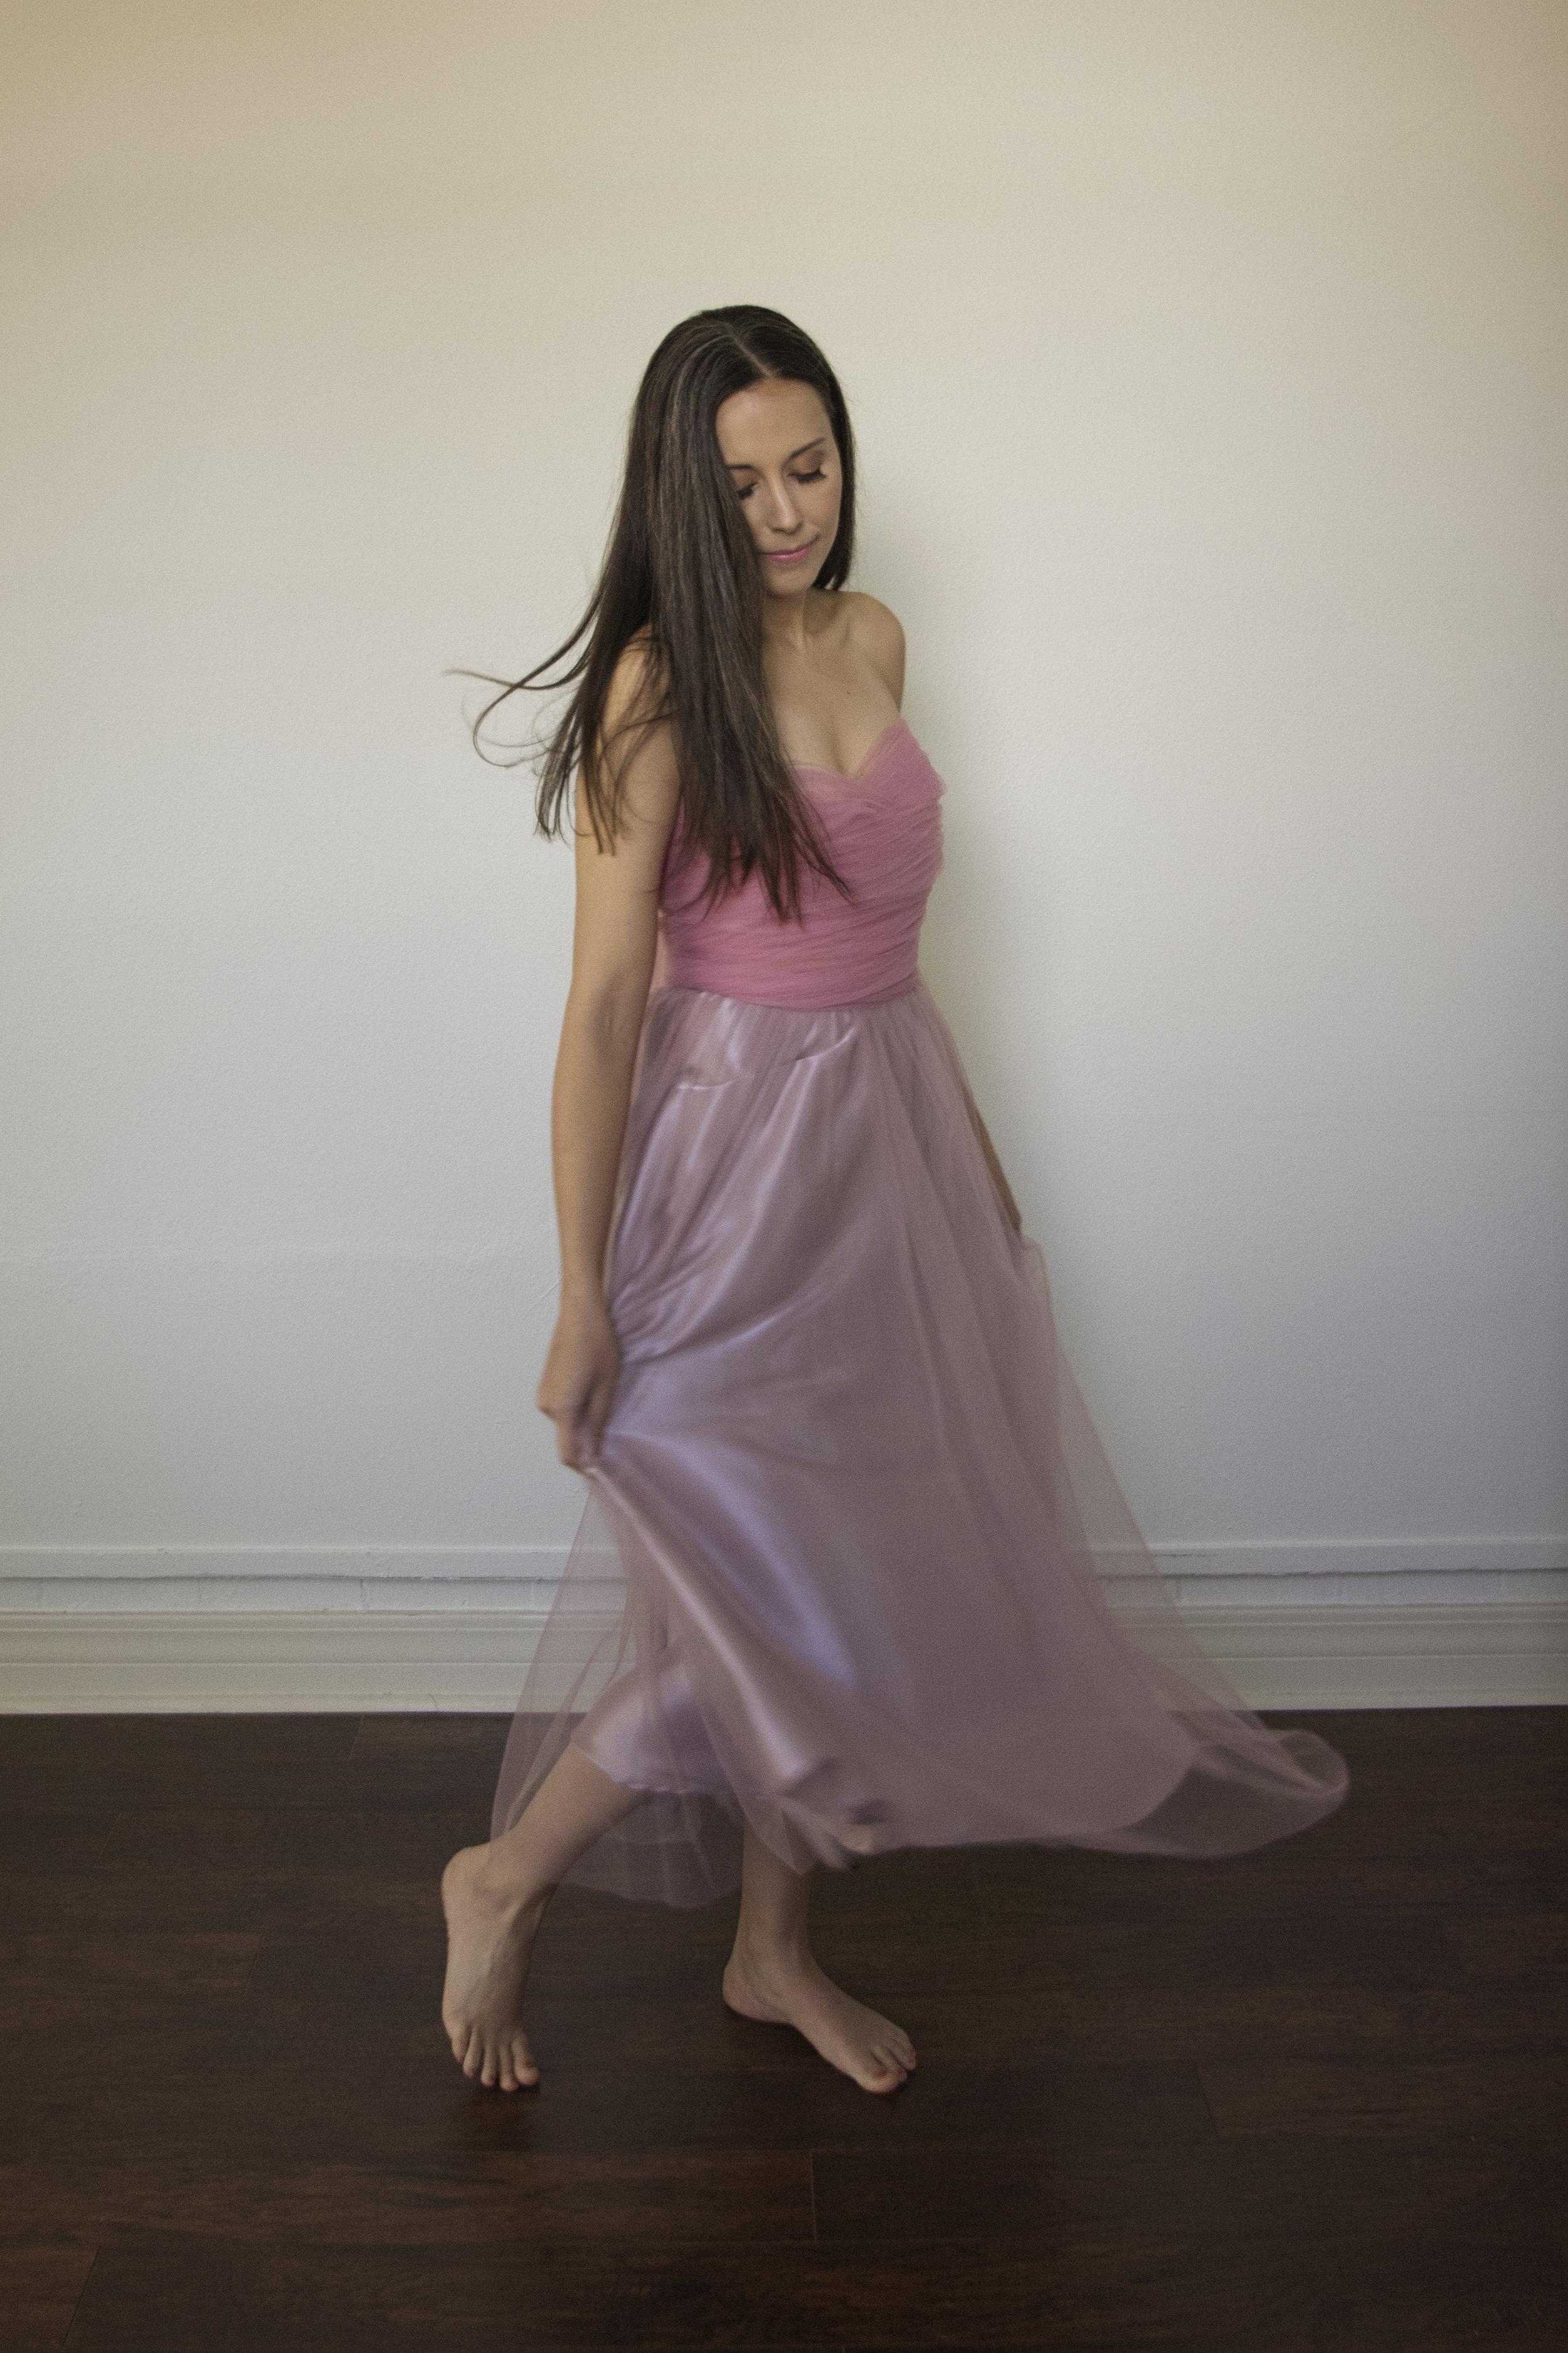 Portrait of a Woman Dancing